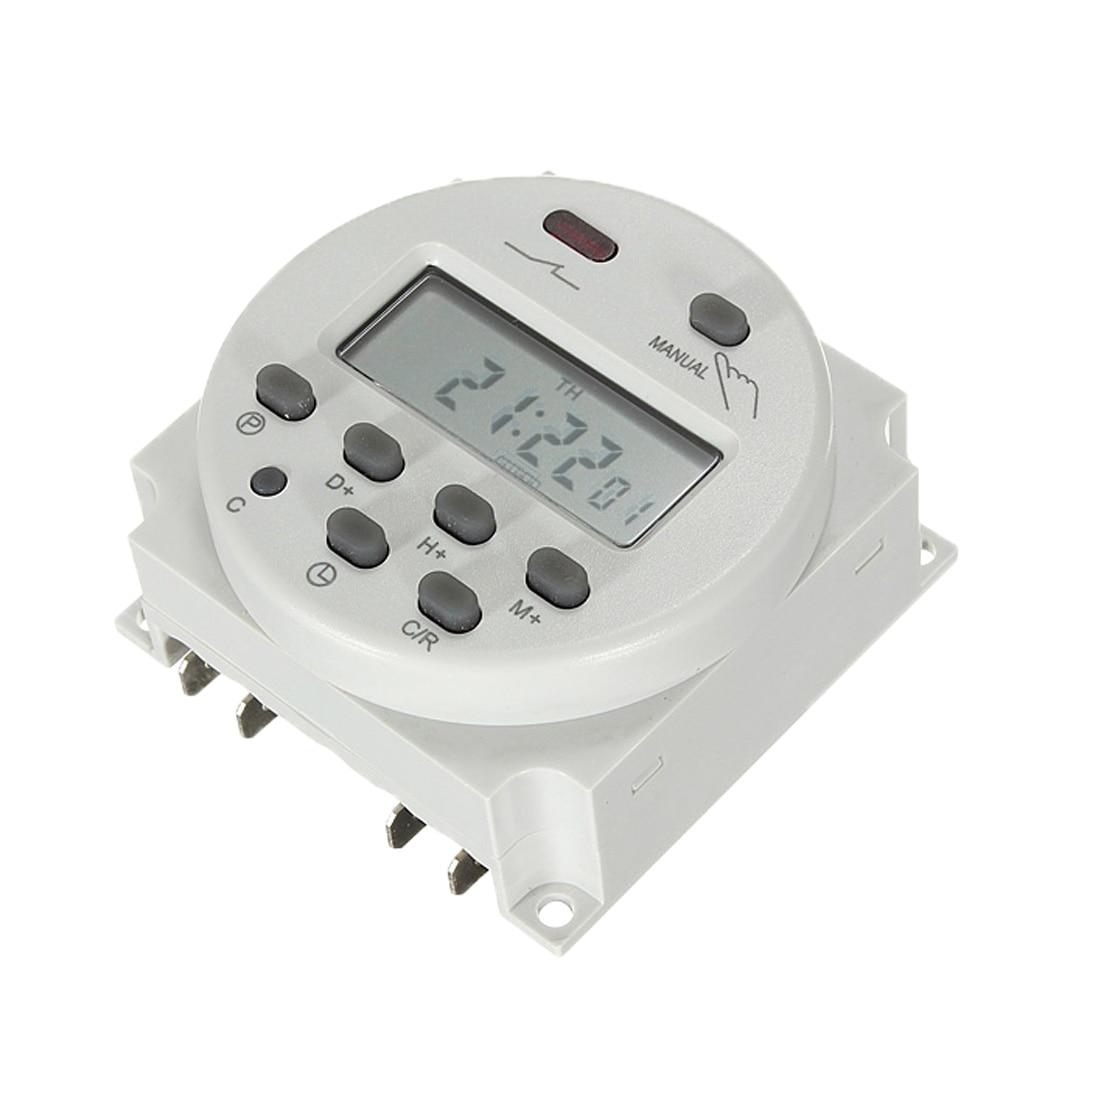 Mini AC 12V 220V Digital LCD Power Timer Programmable Time Switch Relay Timers digital lcd power timer programmable 7 5va time switch relay 16a timers cn101a timer ac 220v